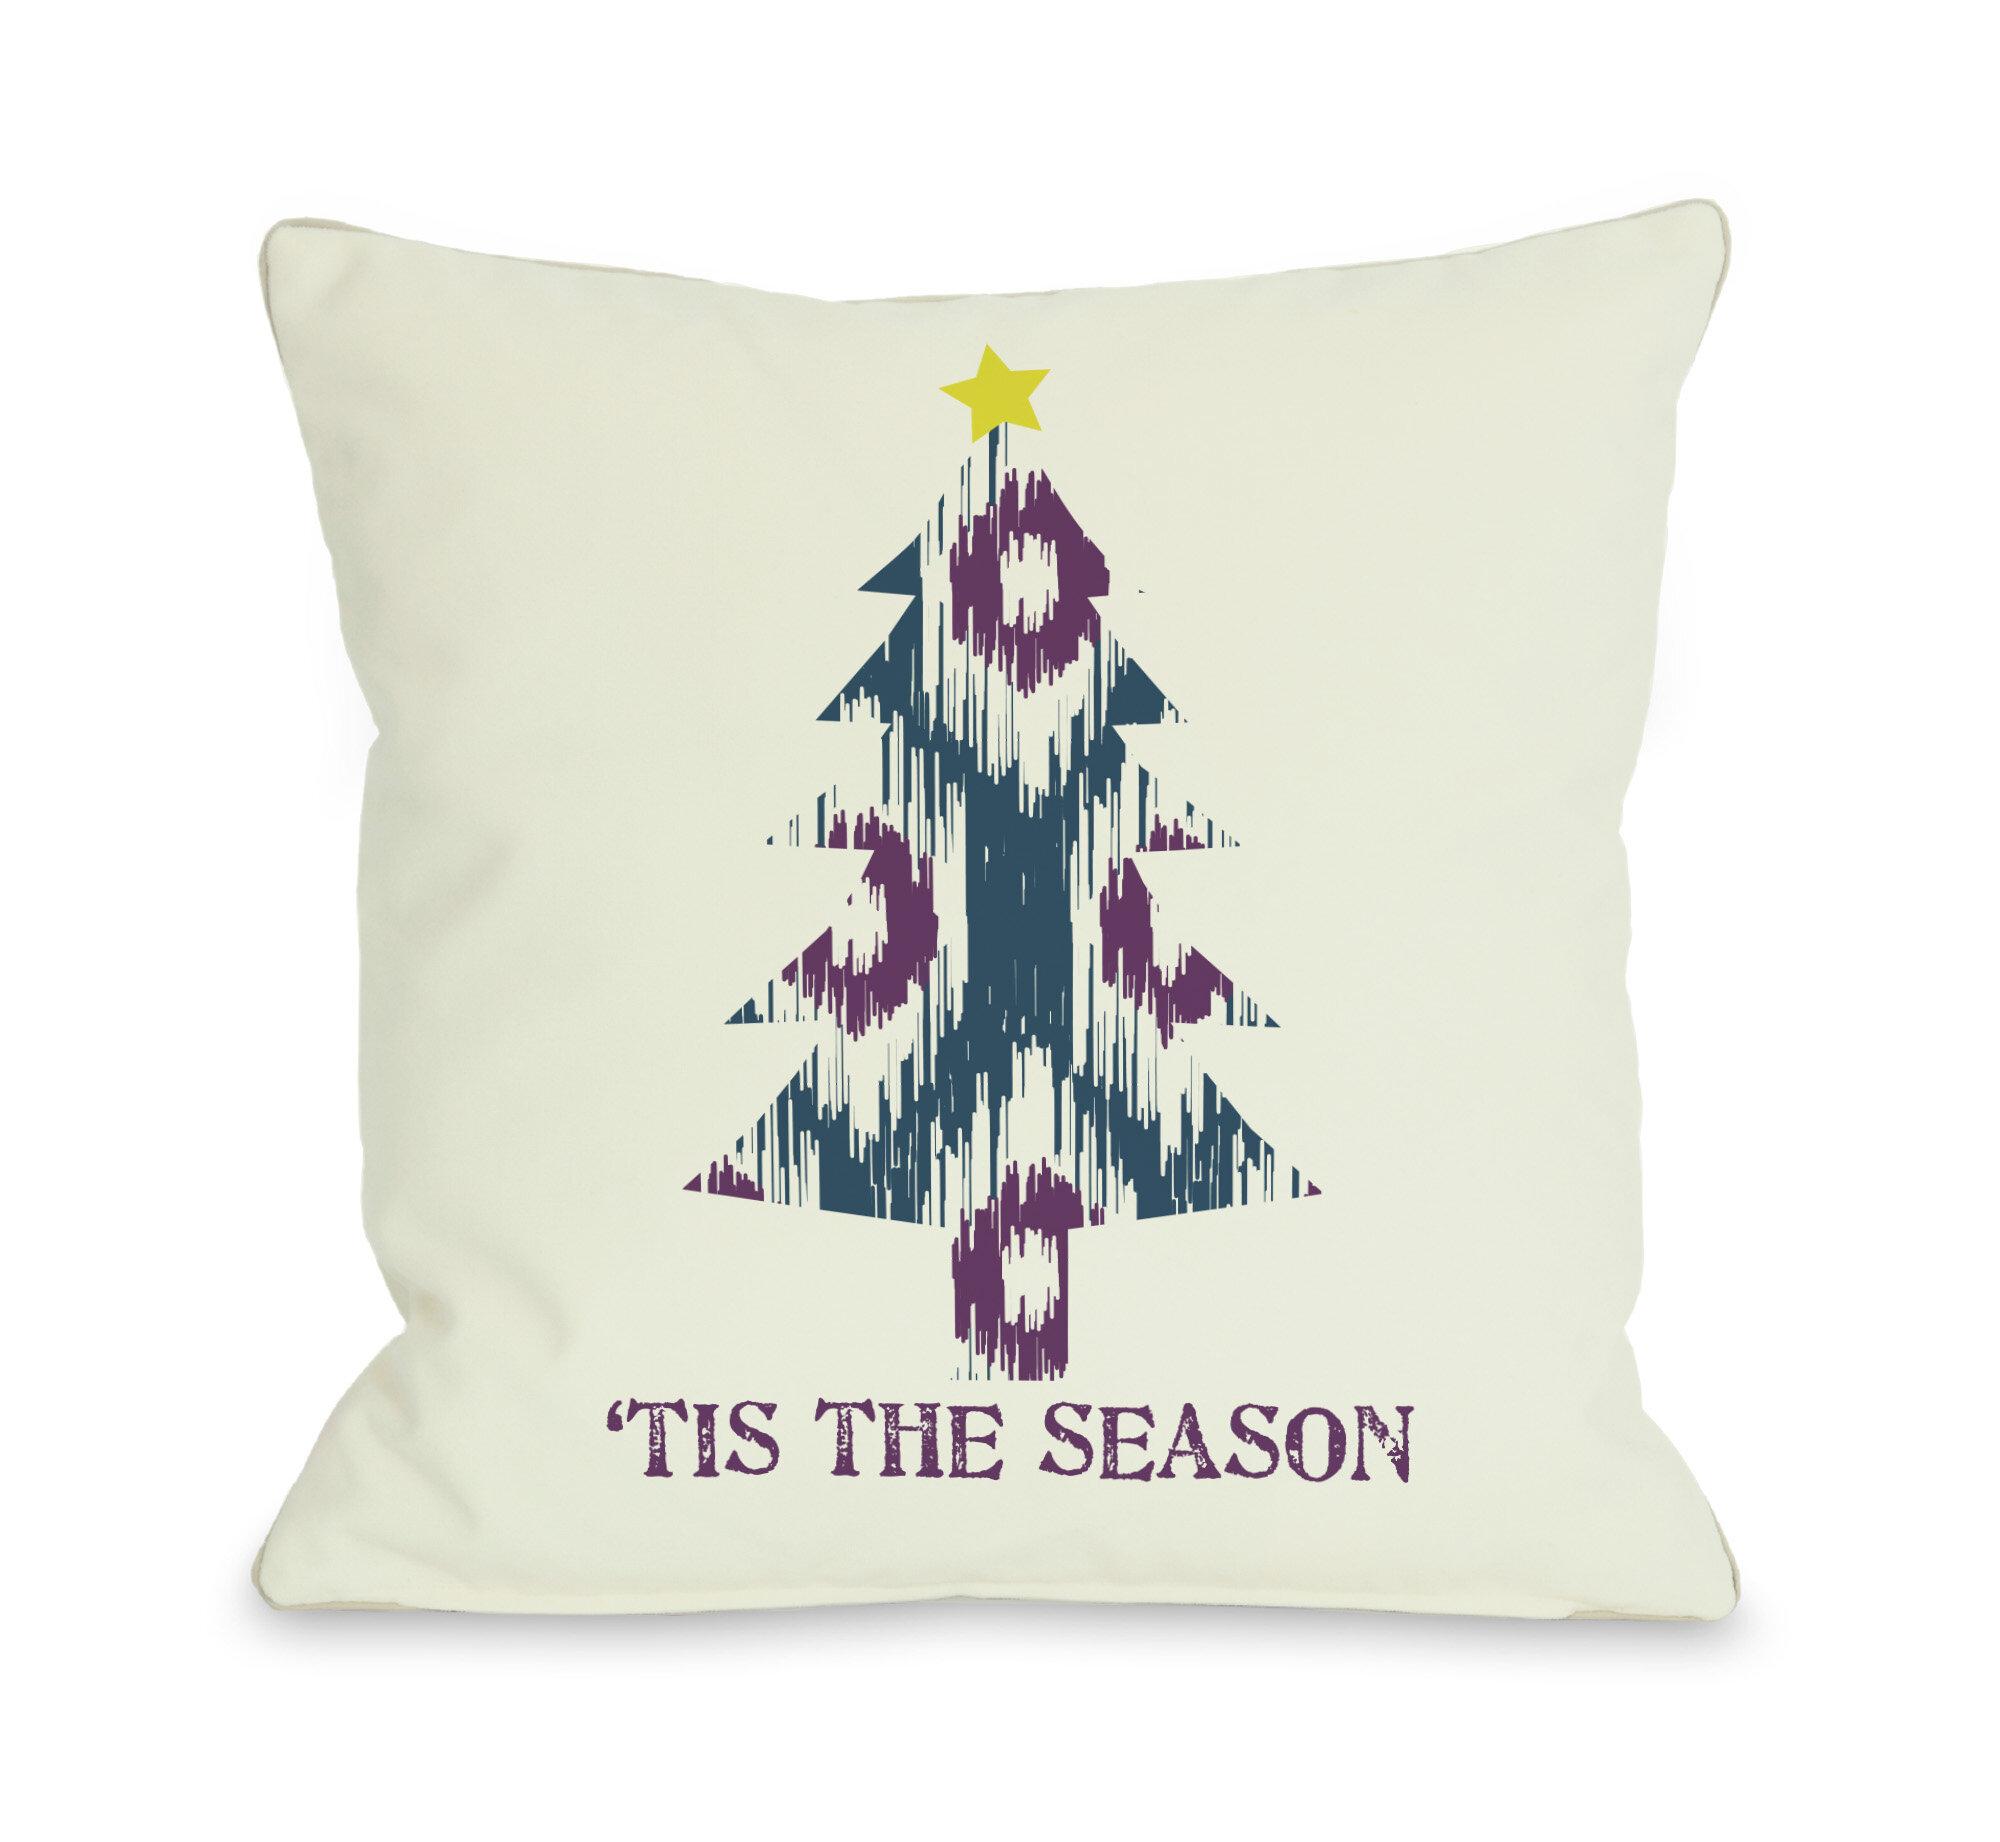 The Holiday Aisle Tavion Tis The Season Ikat Tree Reversible Throw Pillow Wayfair